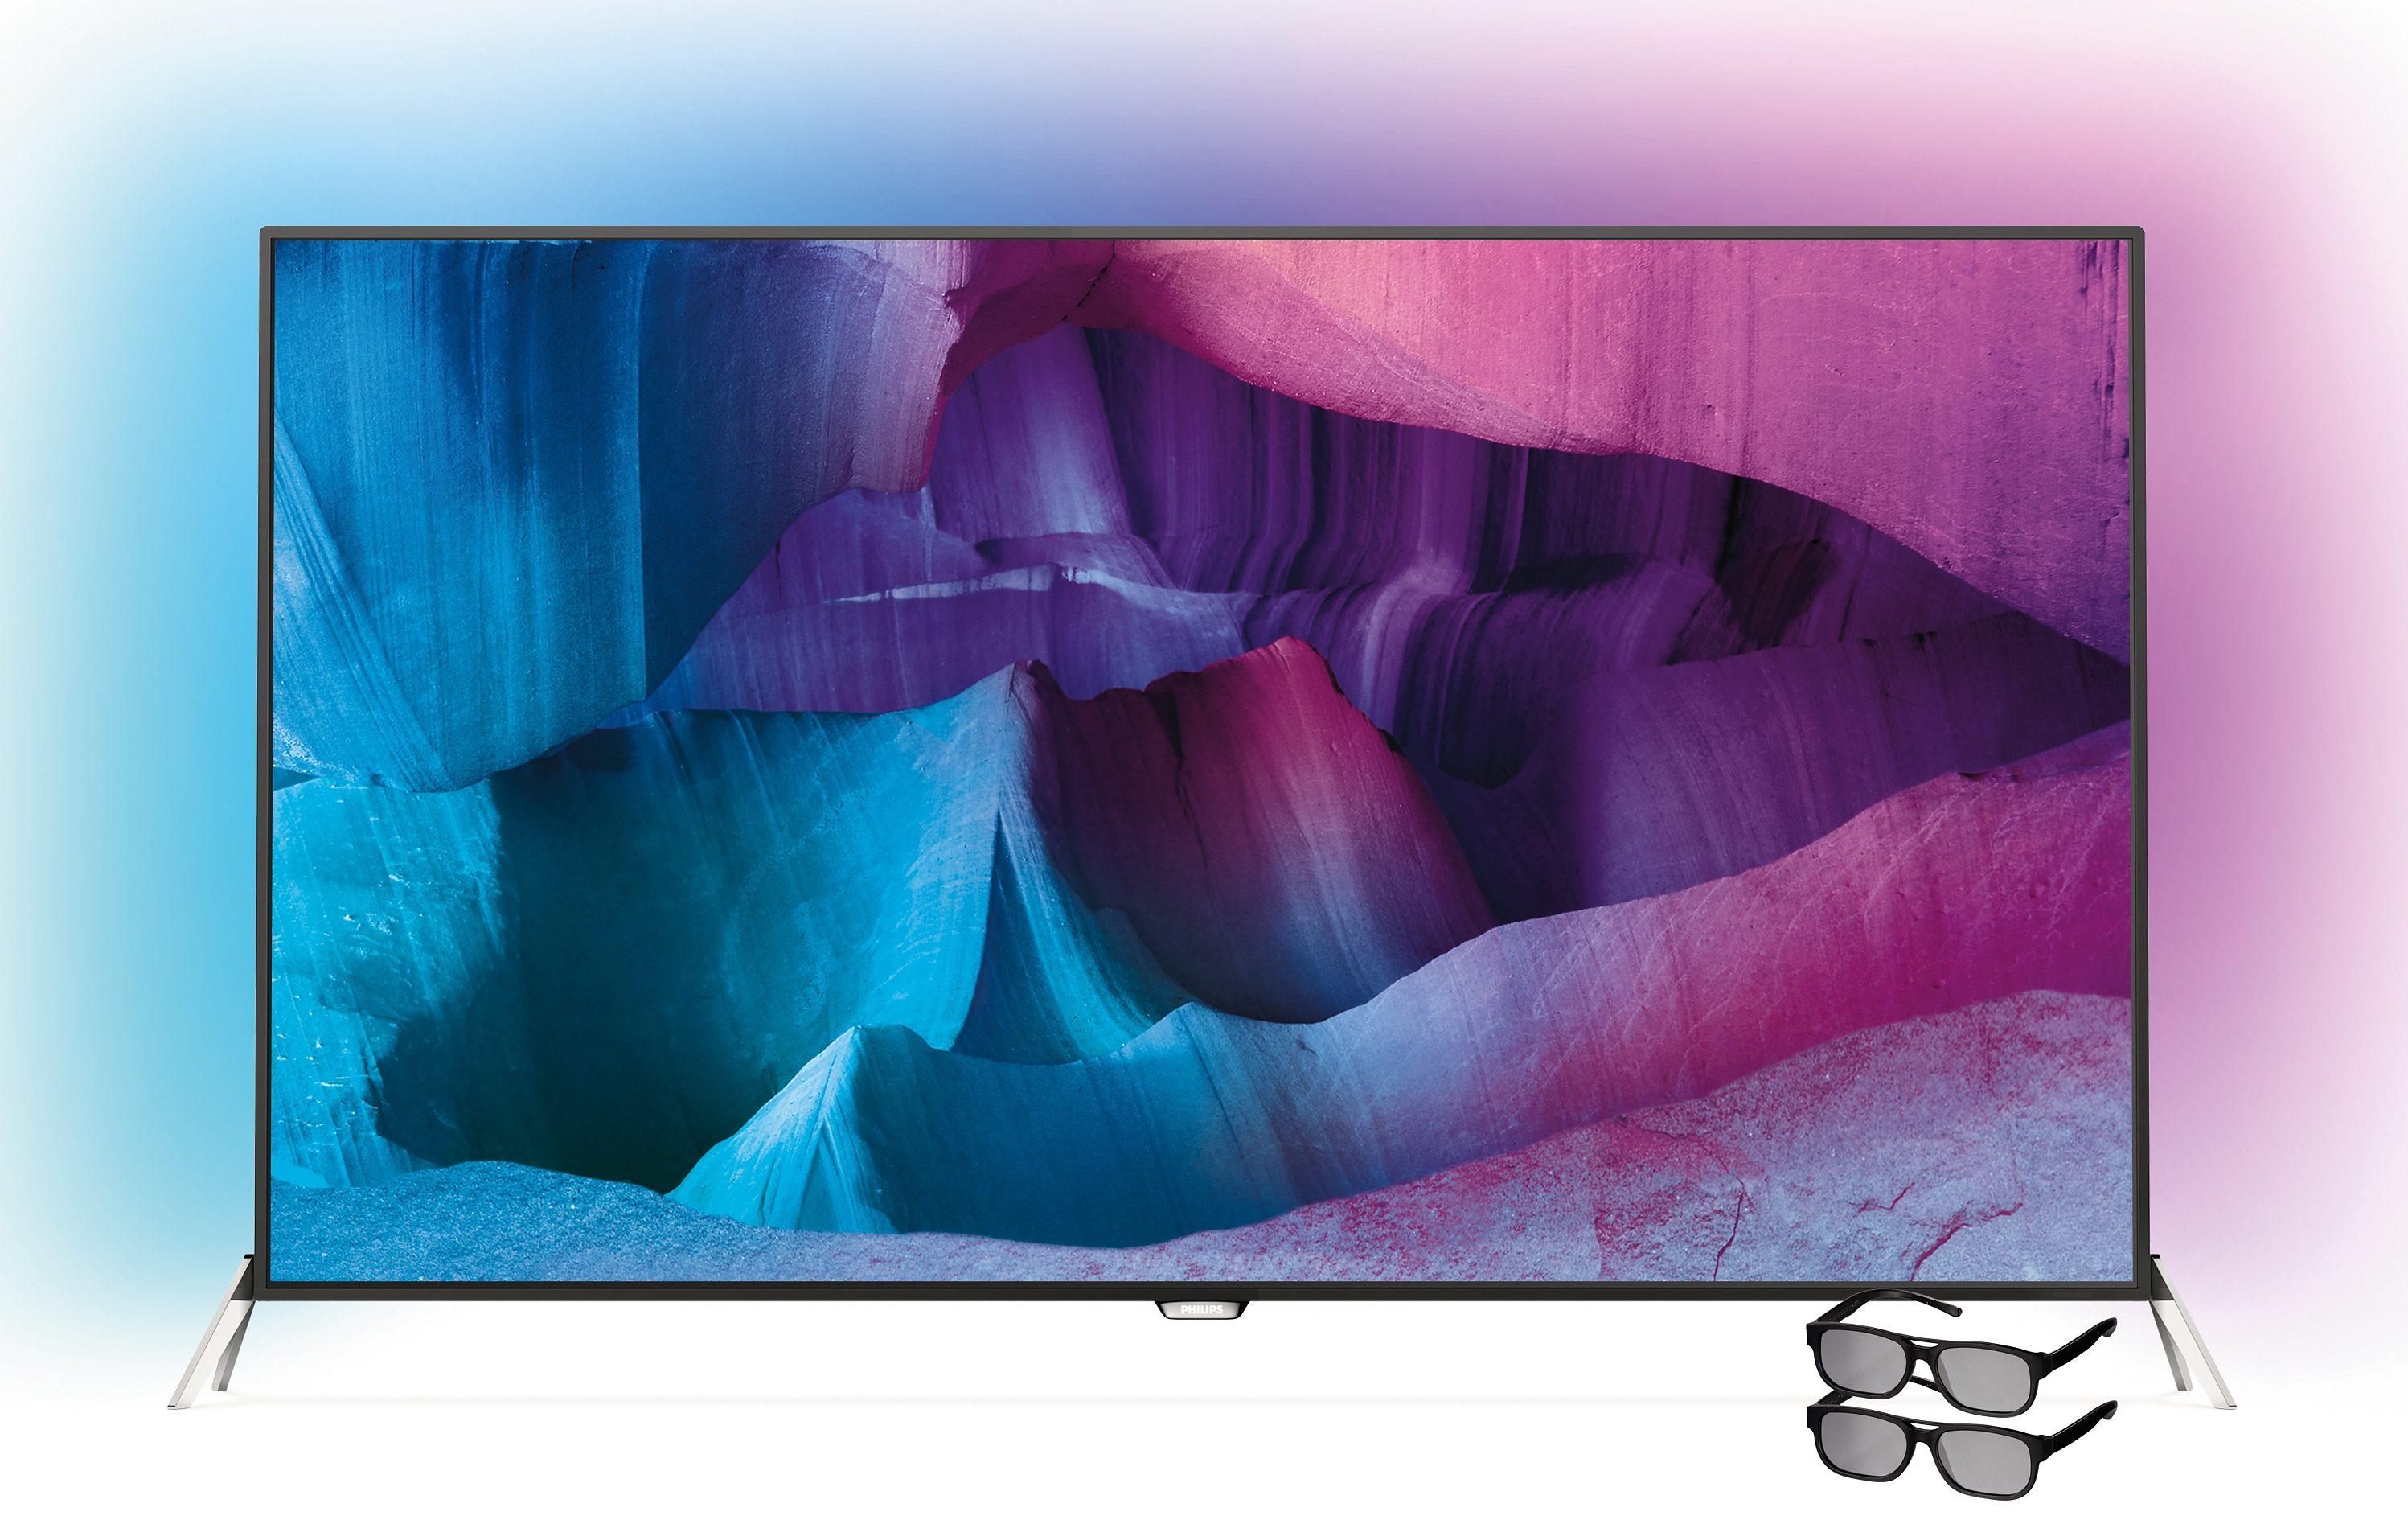 Philips 48PUS7600, 121 cm (48 Zoll), 2160p (4K Ultra HD) Ambilight LED Fernseher